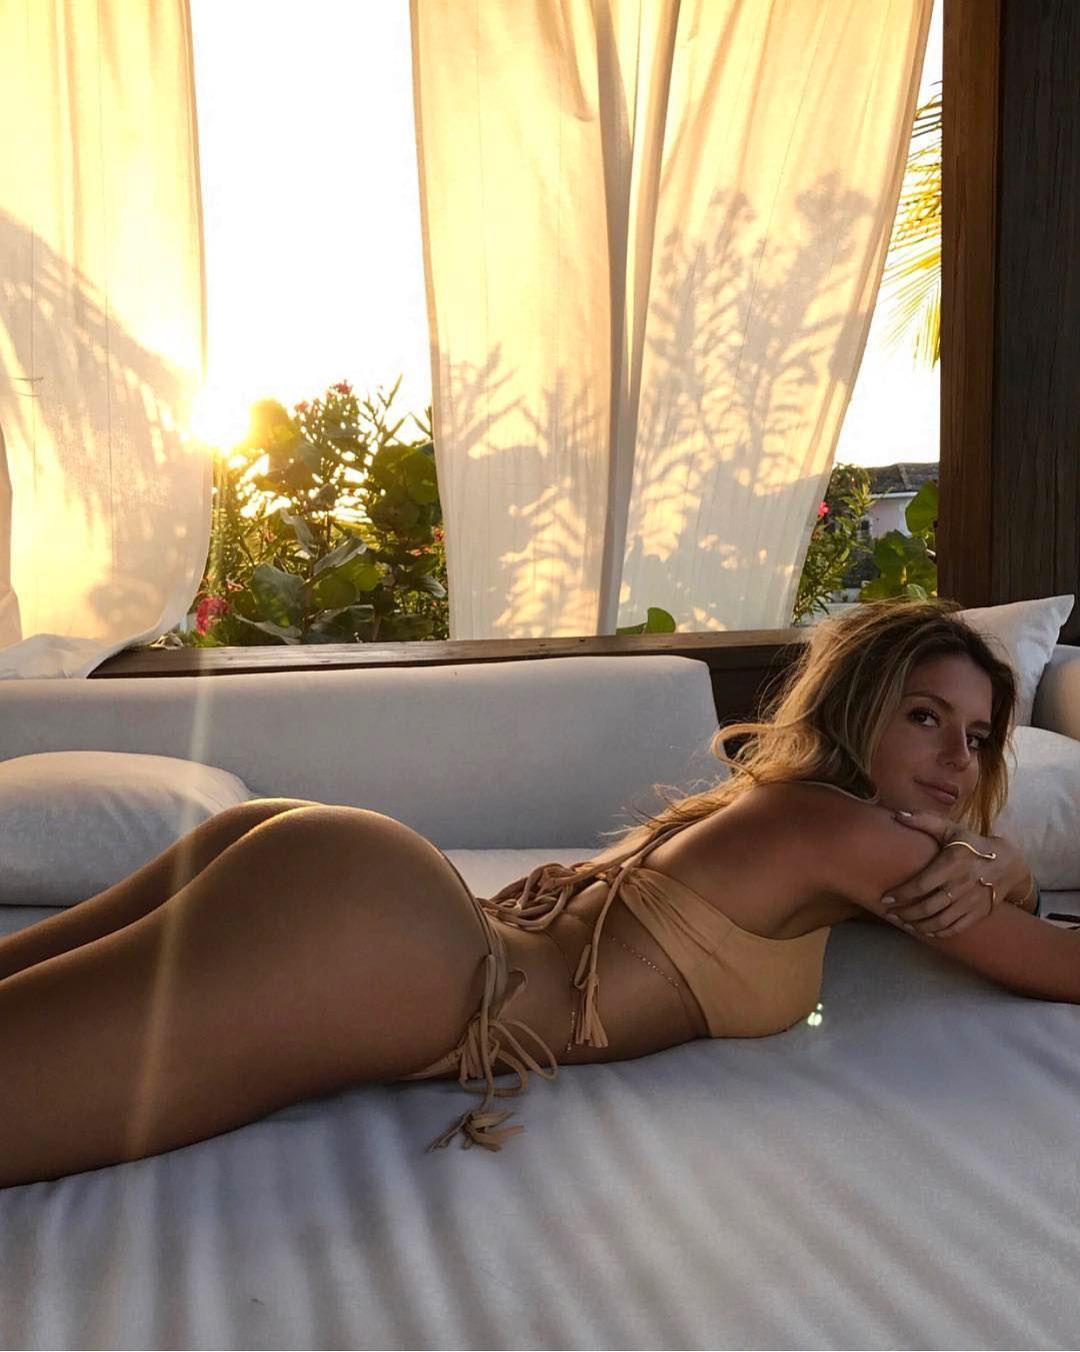 Brittny gastineau paparazzi,Hope beel bikini Porno photo Alina Baikova Nude Hot Photo Collection - 7 Photos,Costume magazine